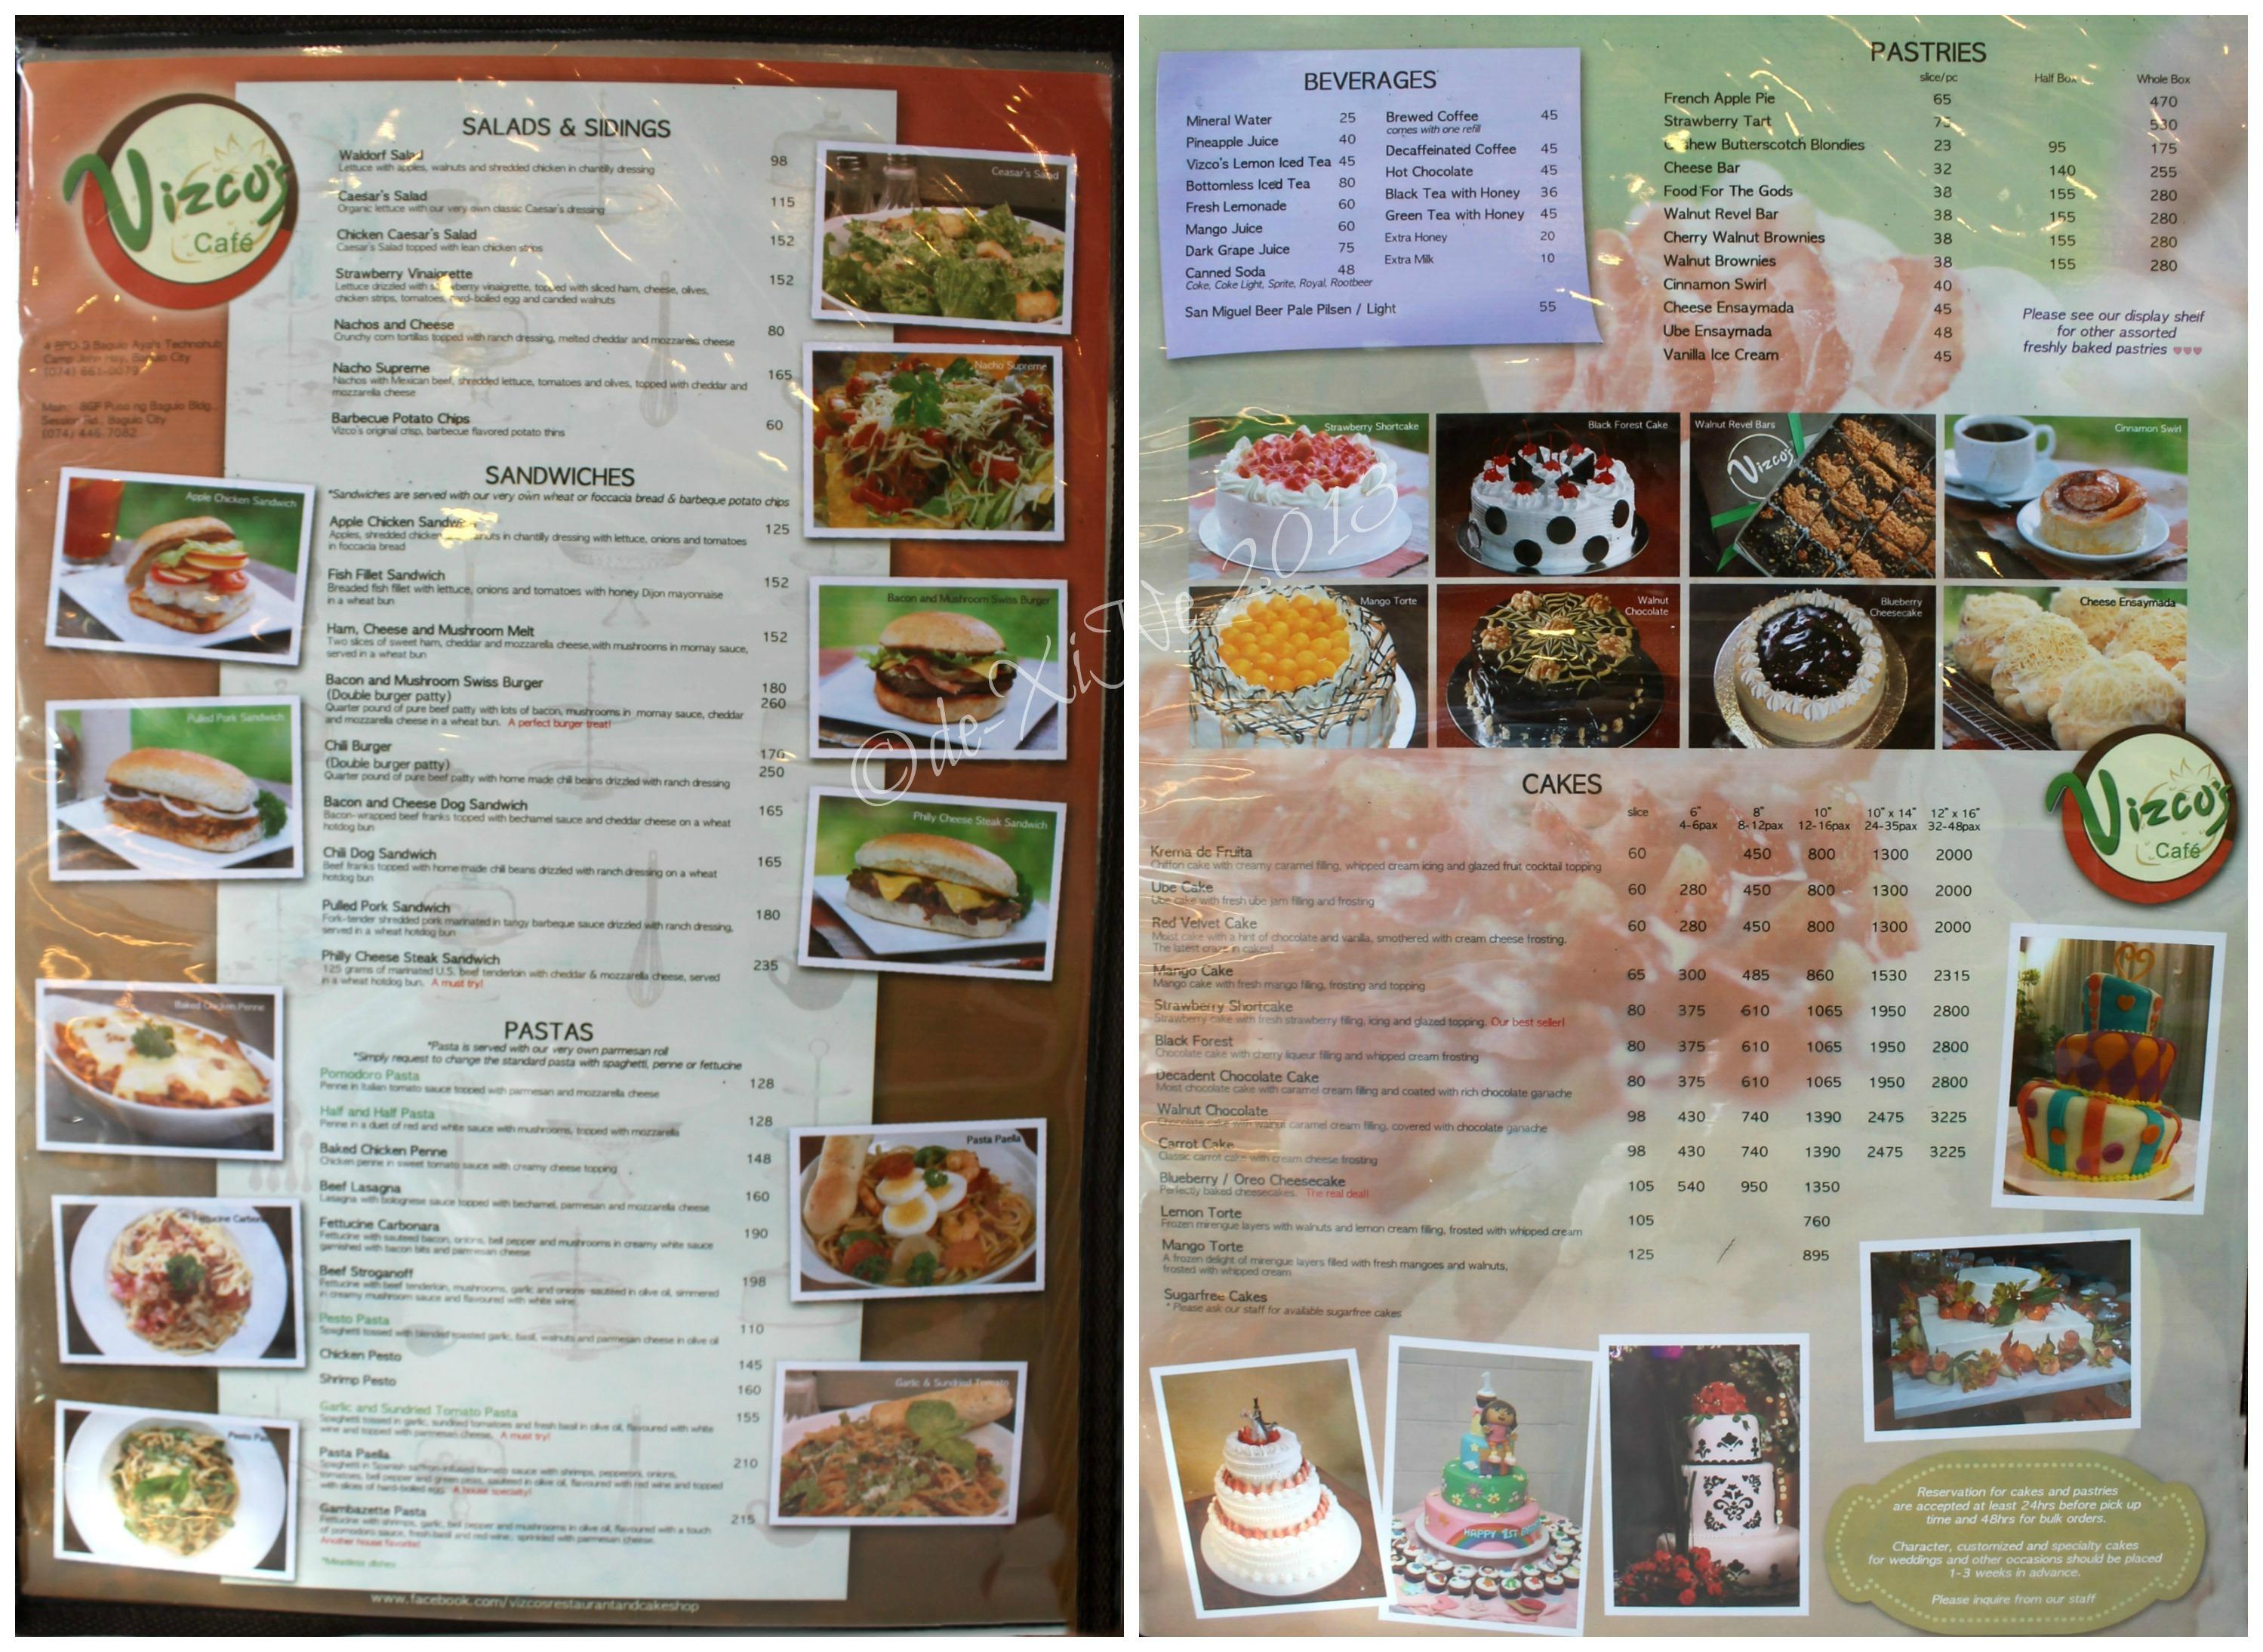 baguio dining a la carte – menus, menus, menus | x marks the spot